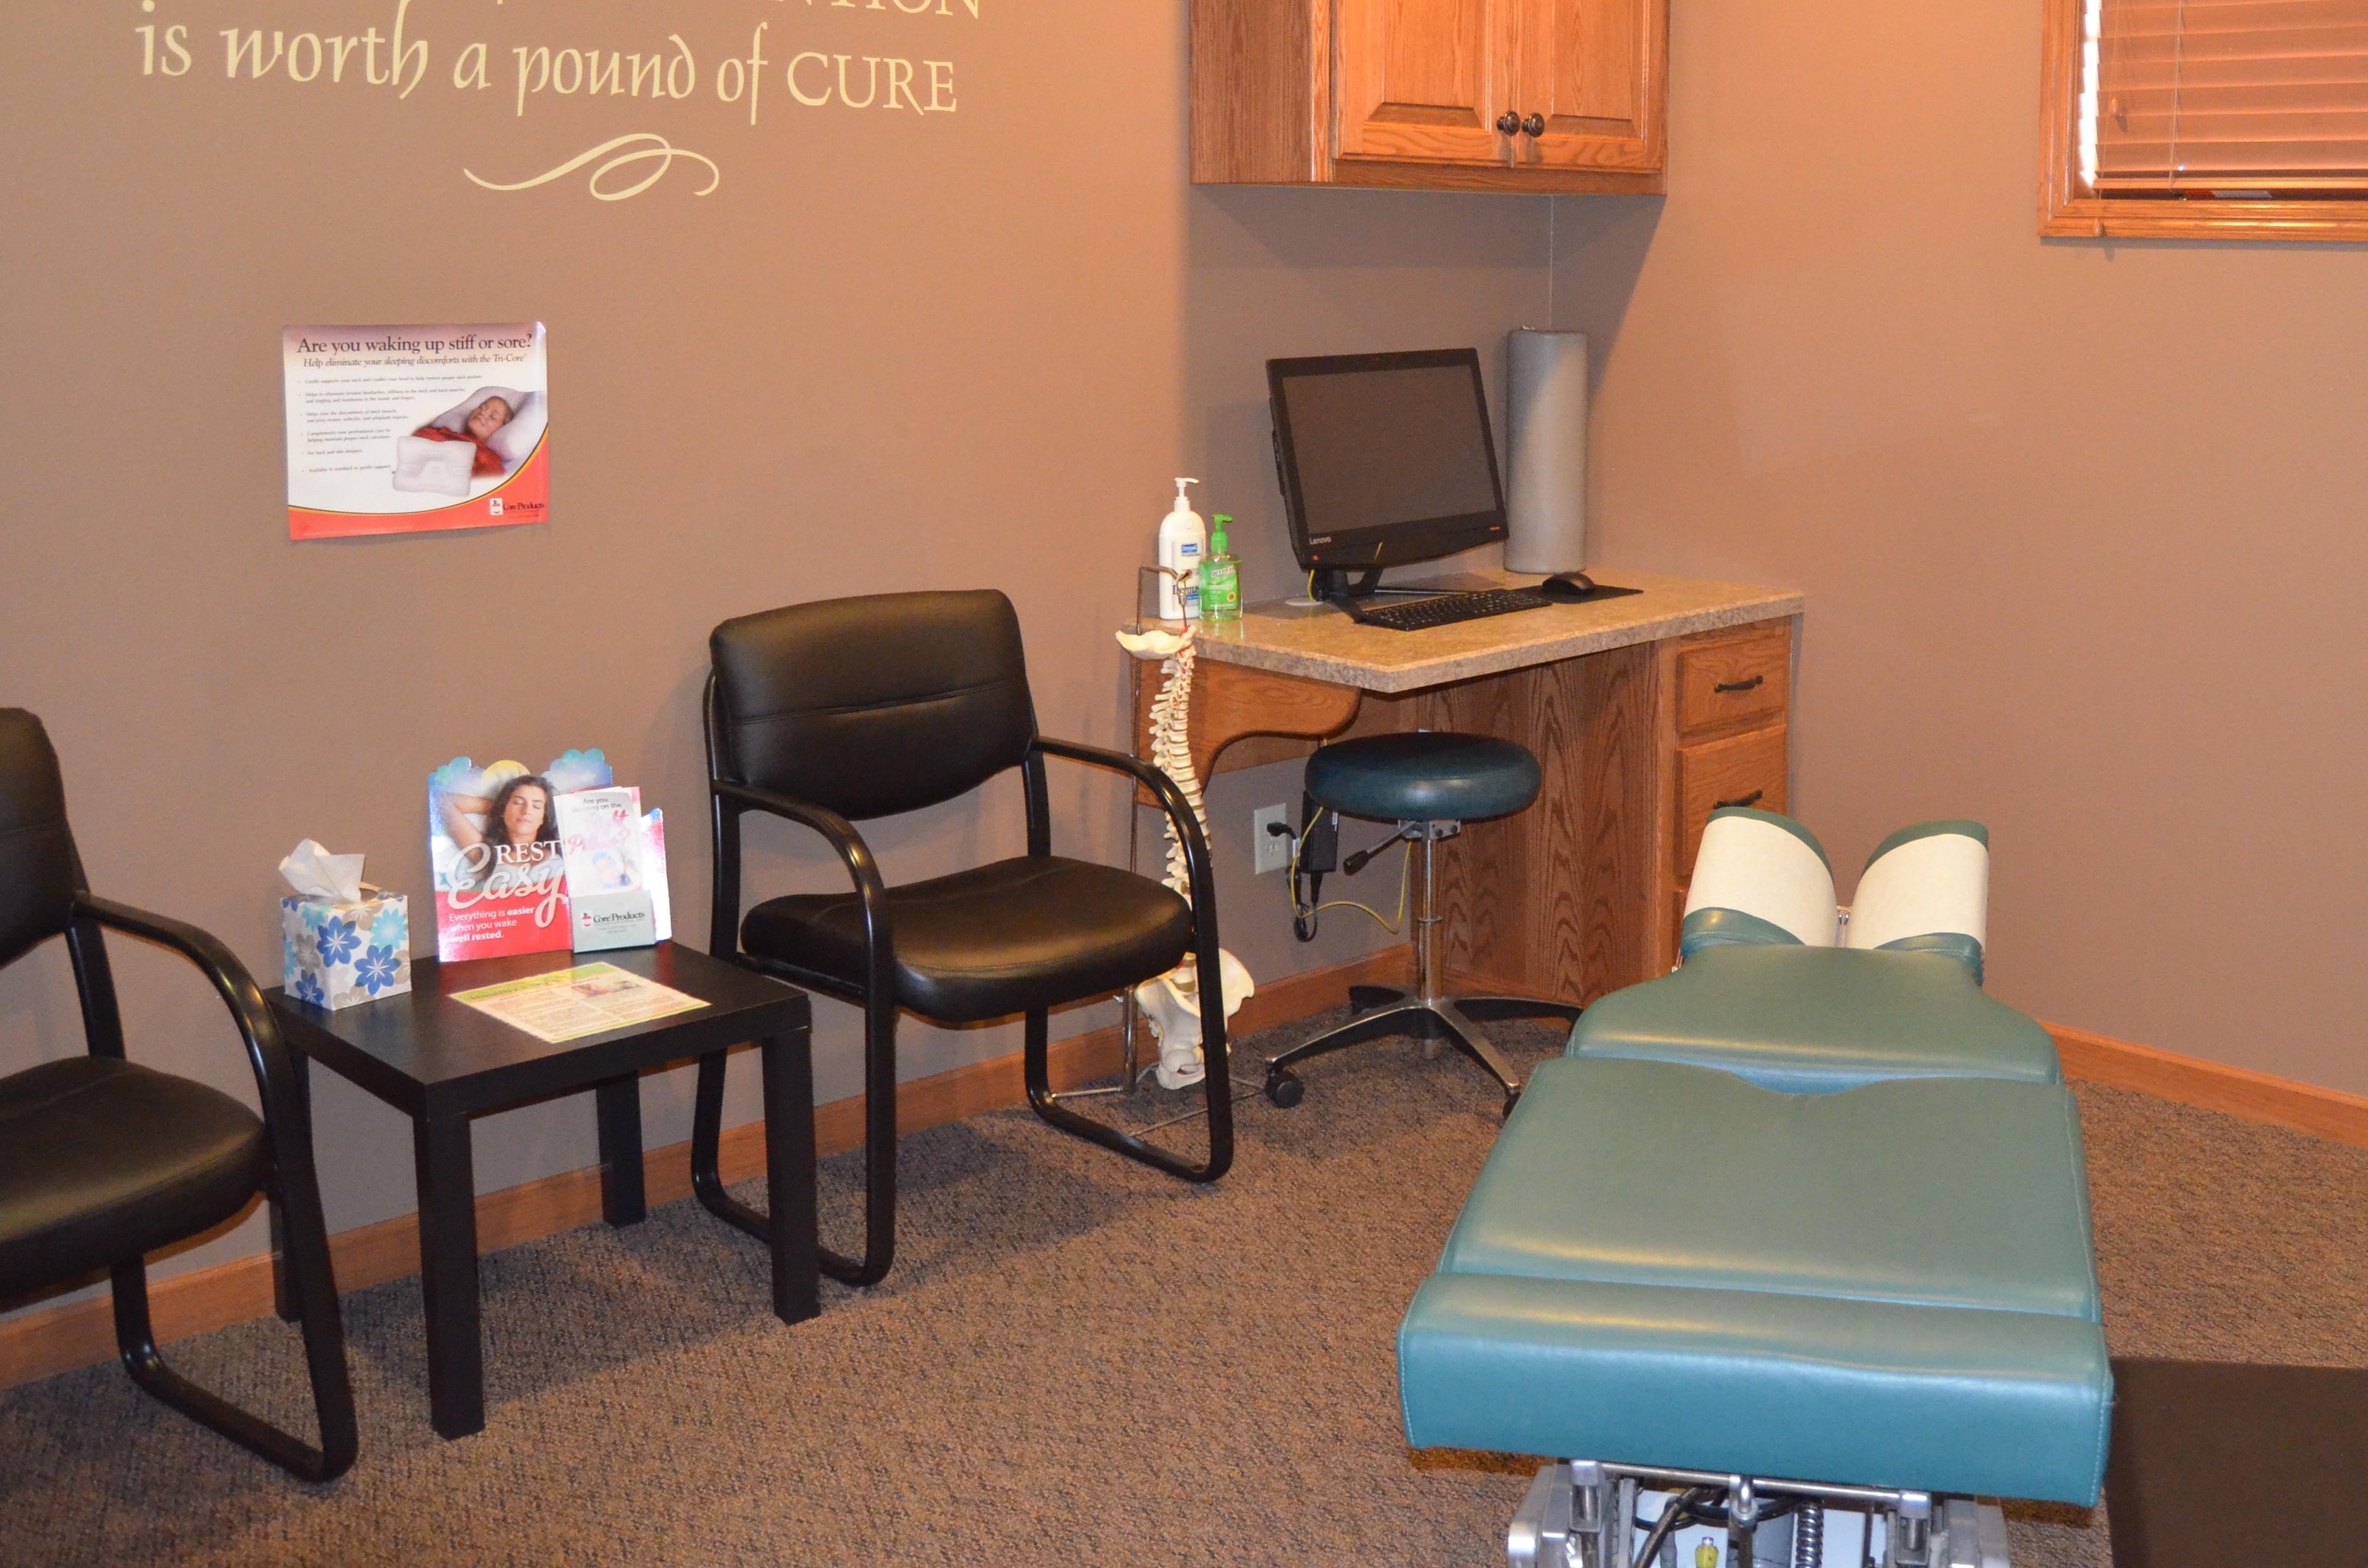 Lyon County Chiropractic image 11